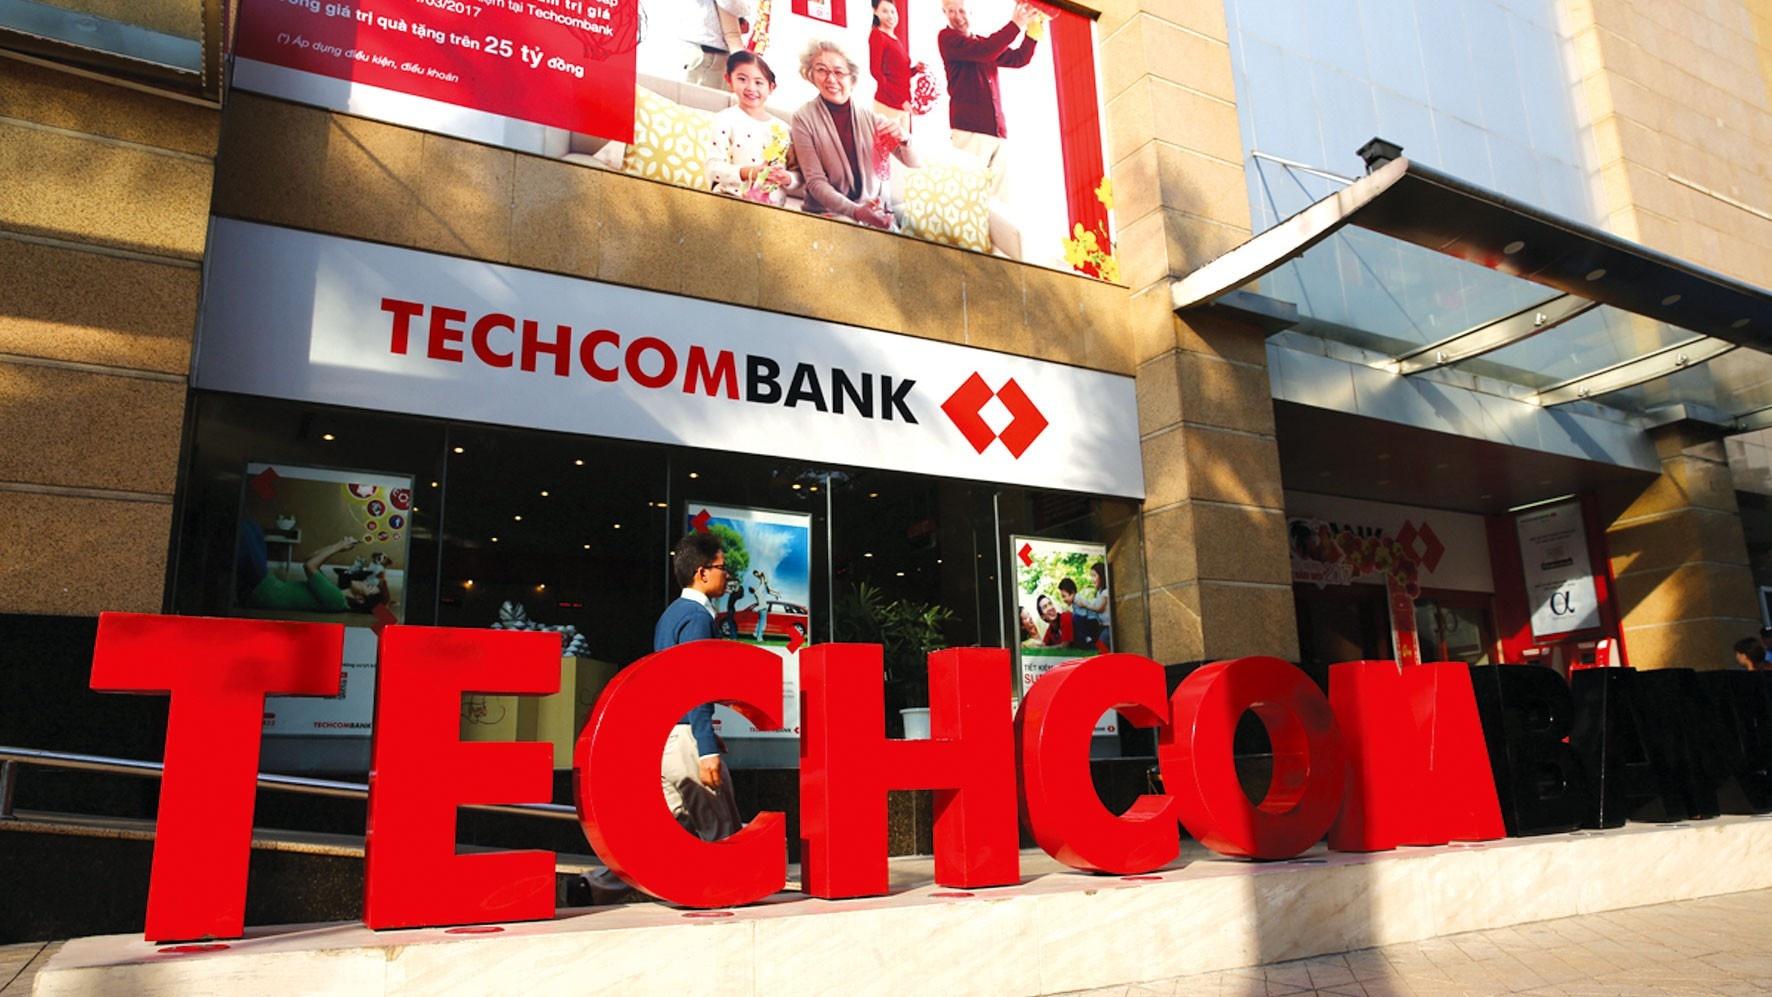 techcombank them tinh nang dat lich tu van bao hiem online